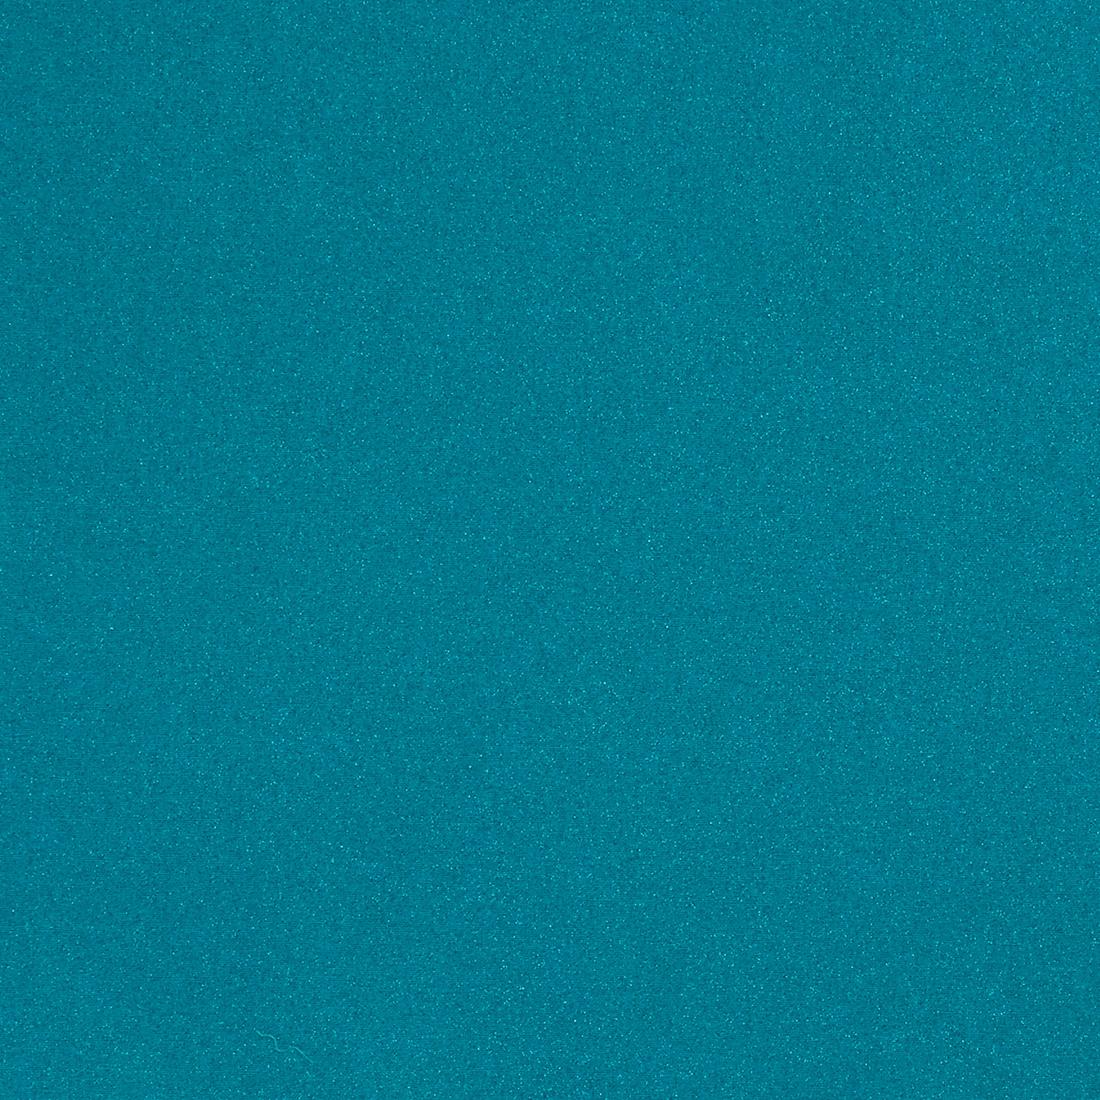 Glitter Cotton Turquoise Craft Fabric